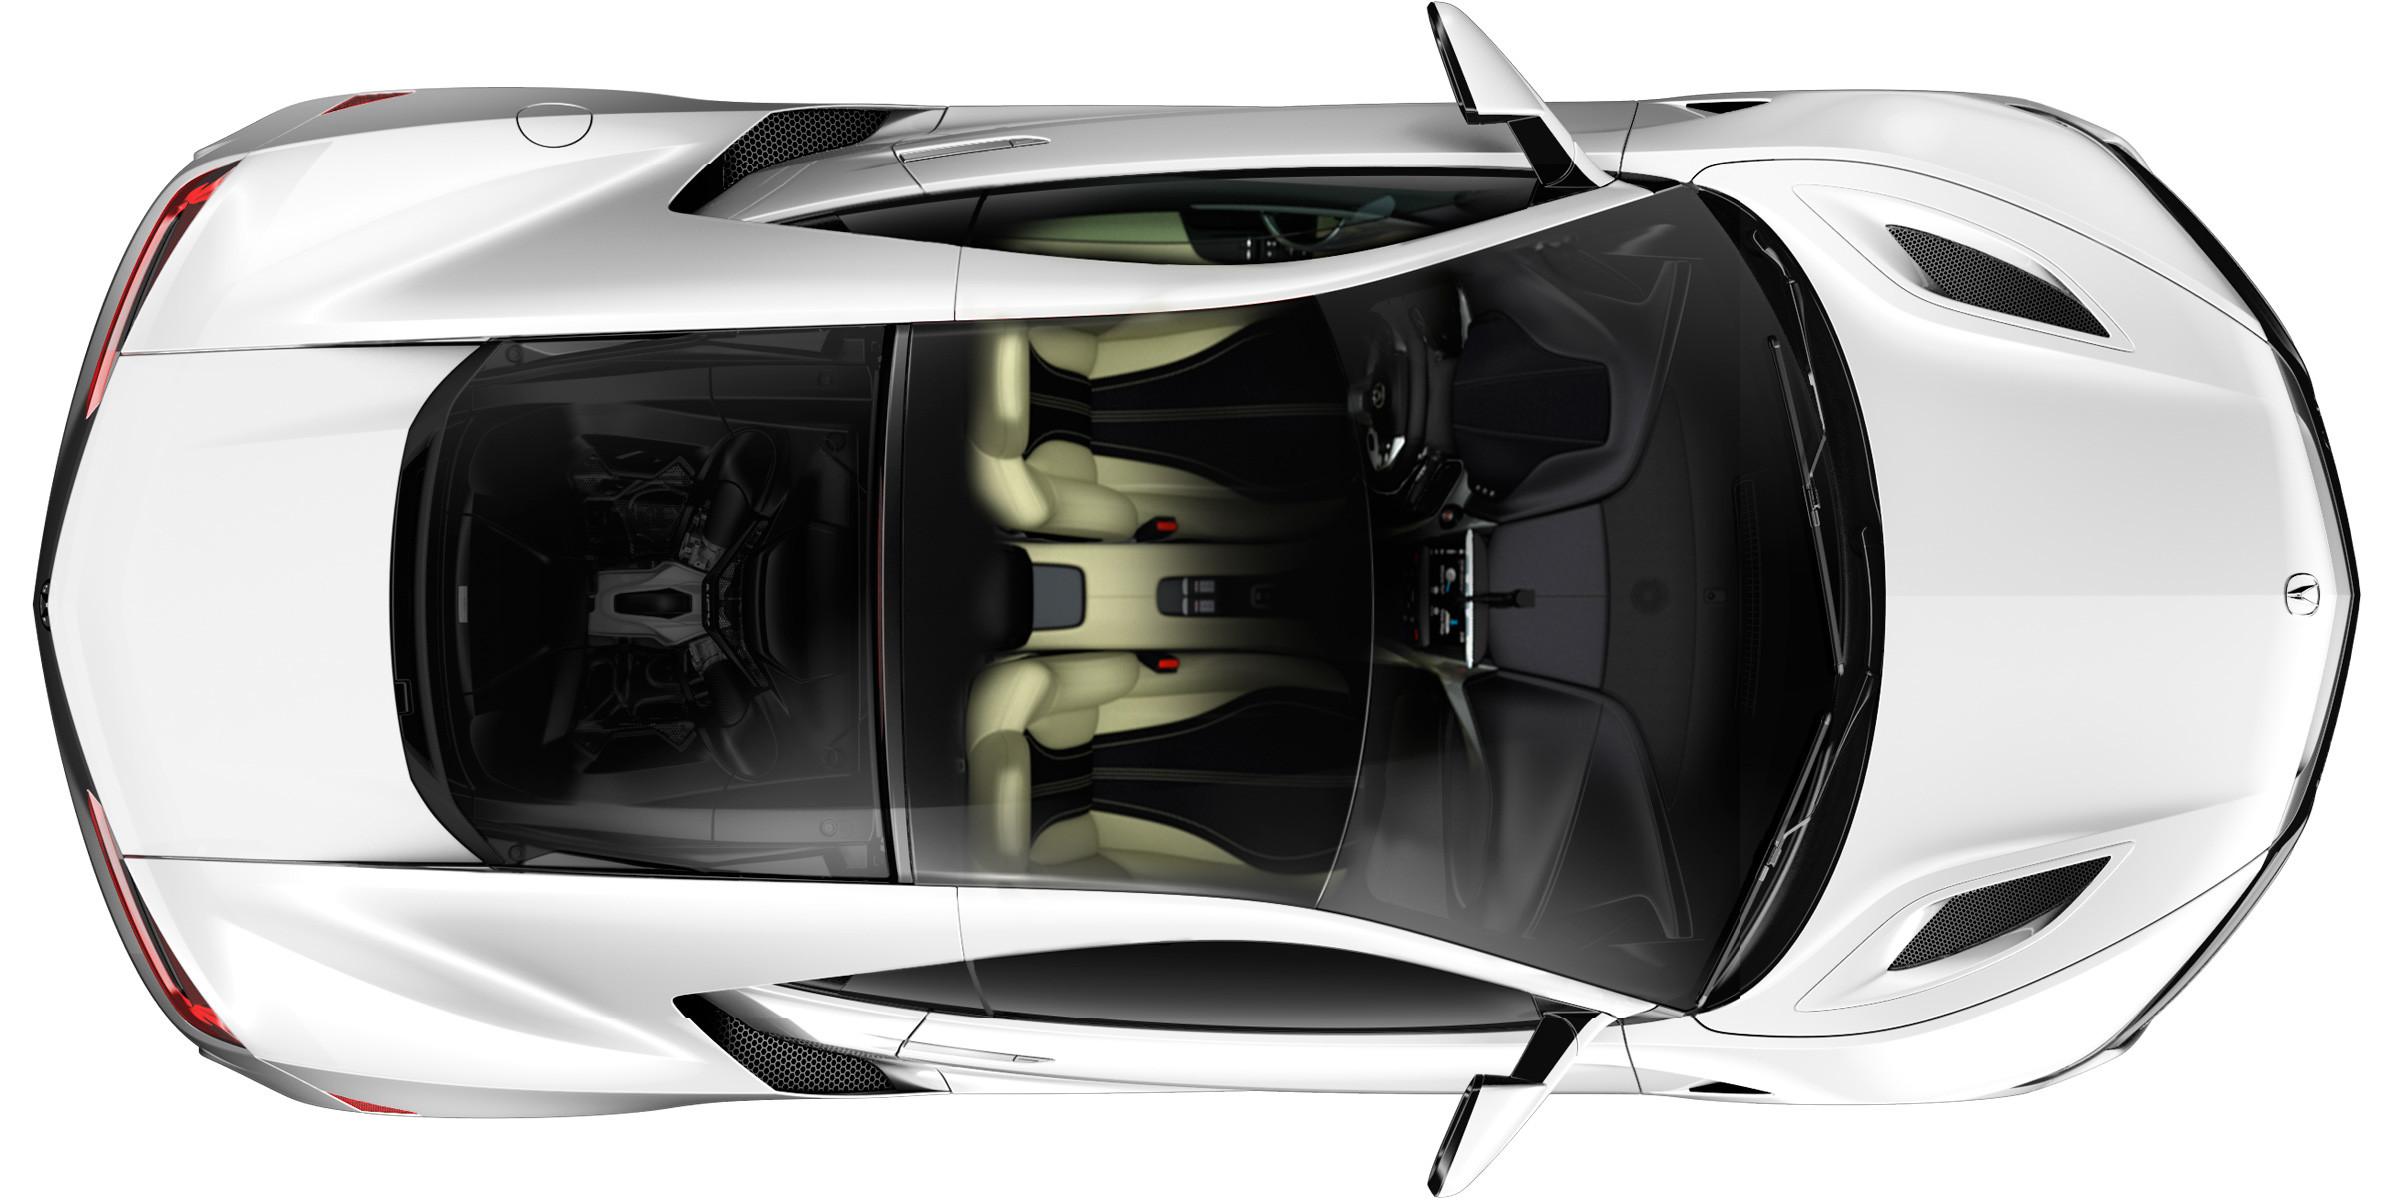 2017 Acura NSX for Sale near Alexandria VA Pohanka Acura